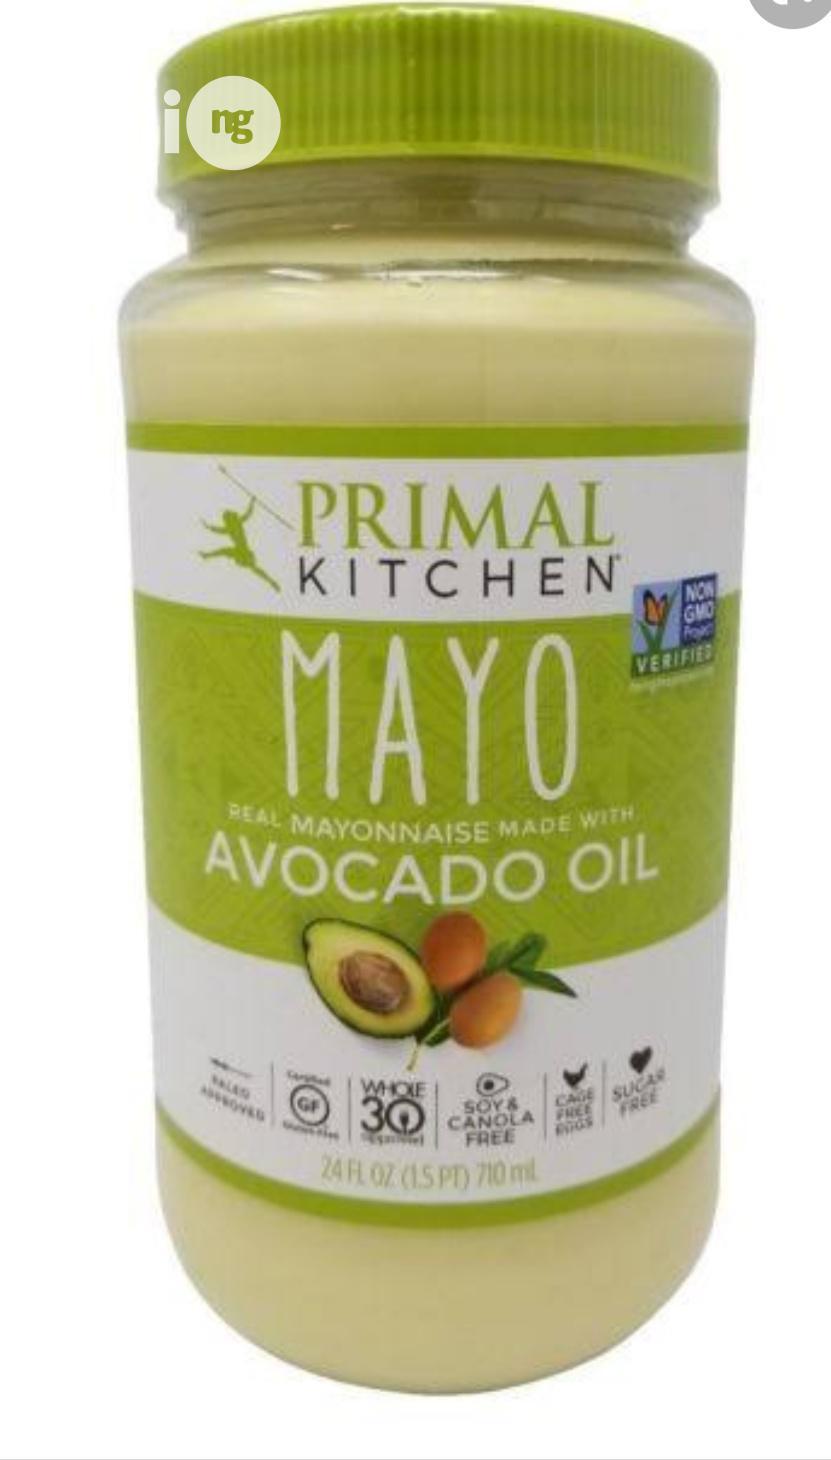 Primal Kitchen Avocado Mayonnaise